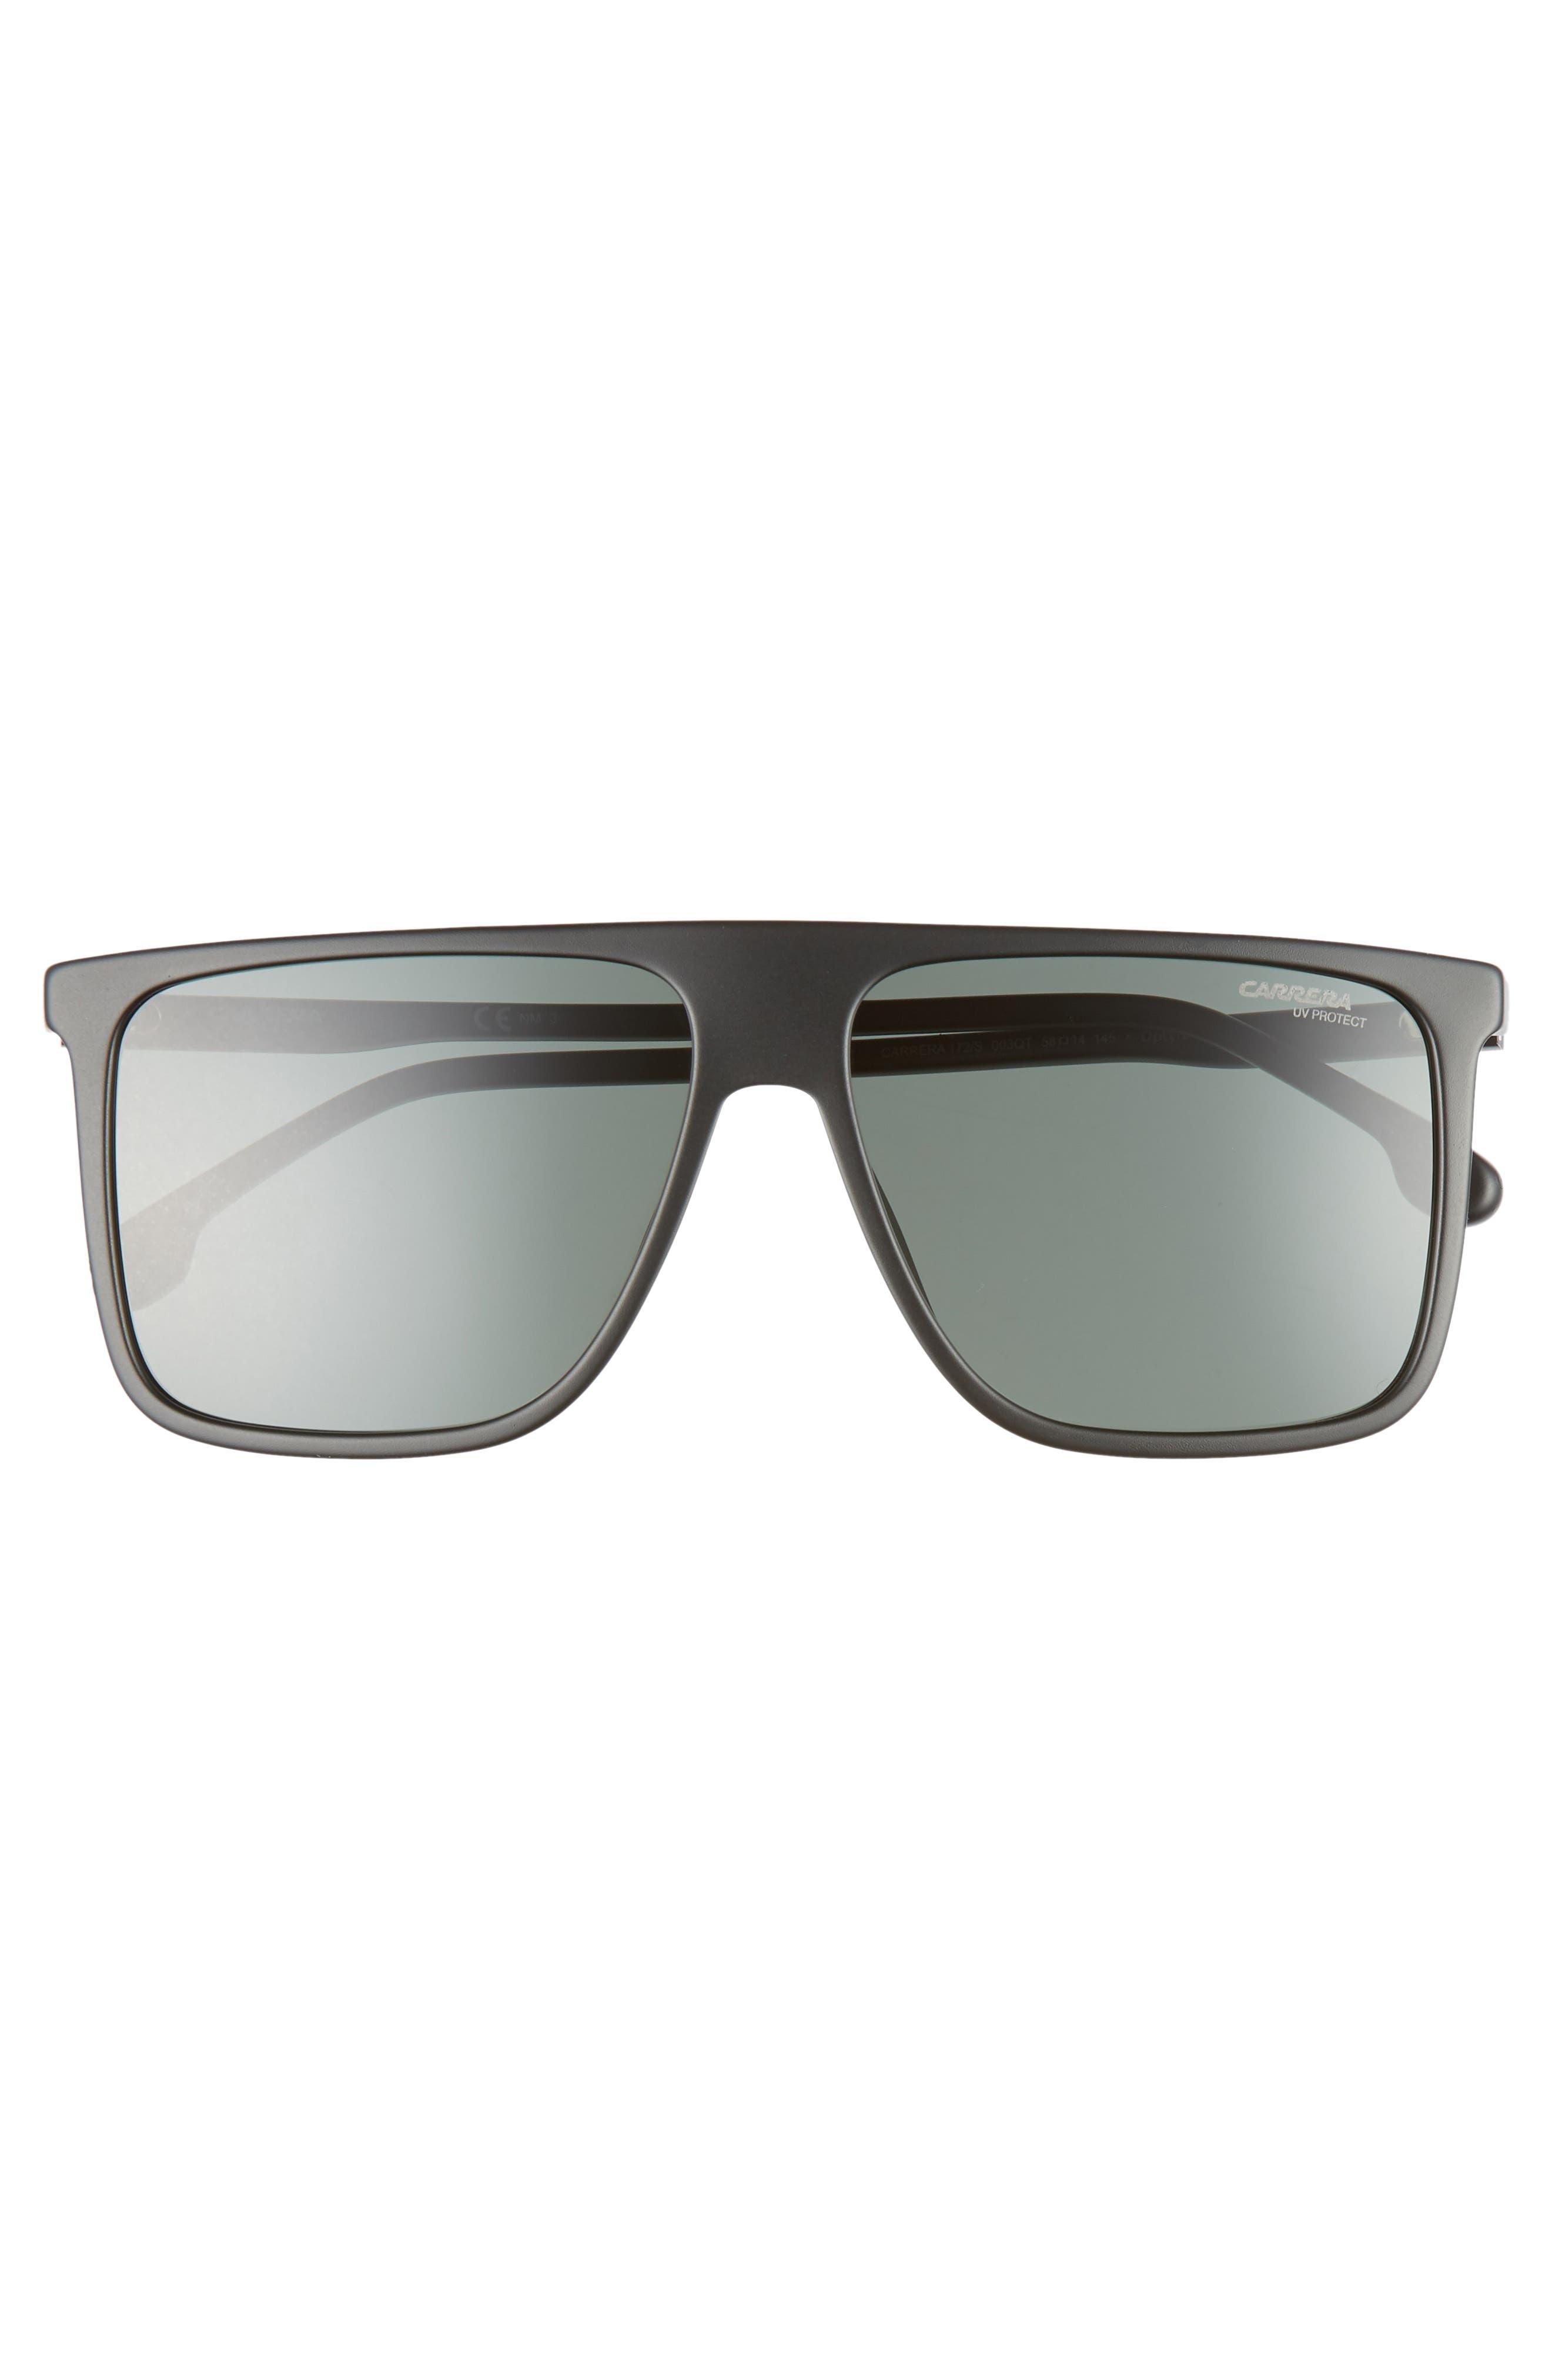 145mm Flat Top Sunglasses,                             Alternate thumbnail 2, color,                             MATTE BLACK